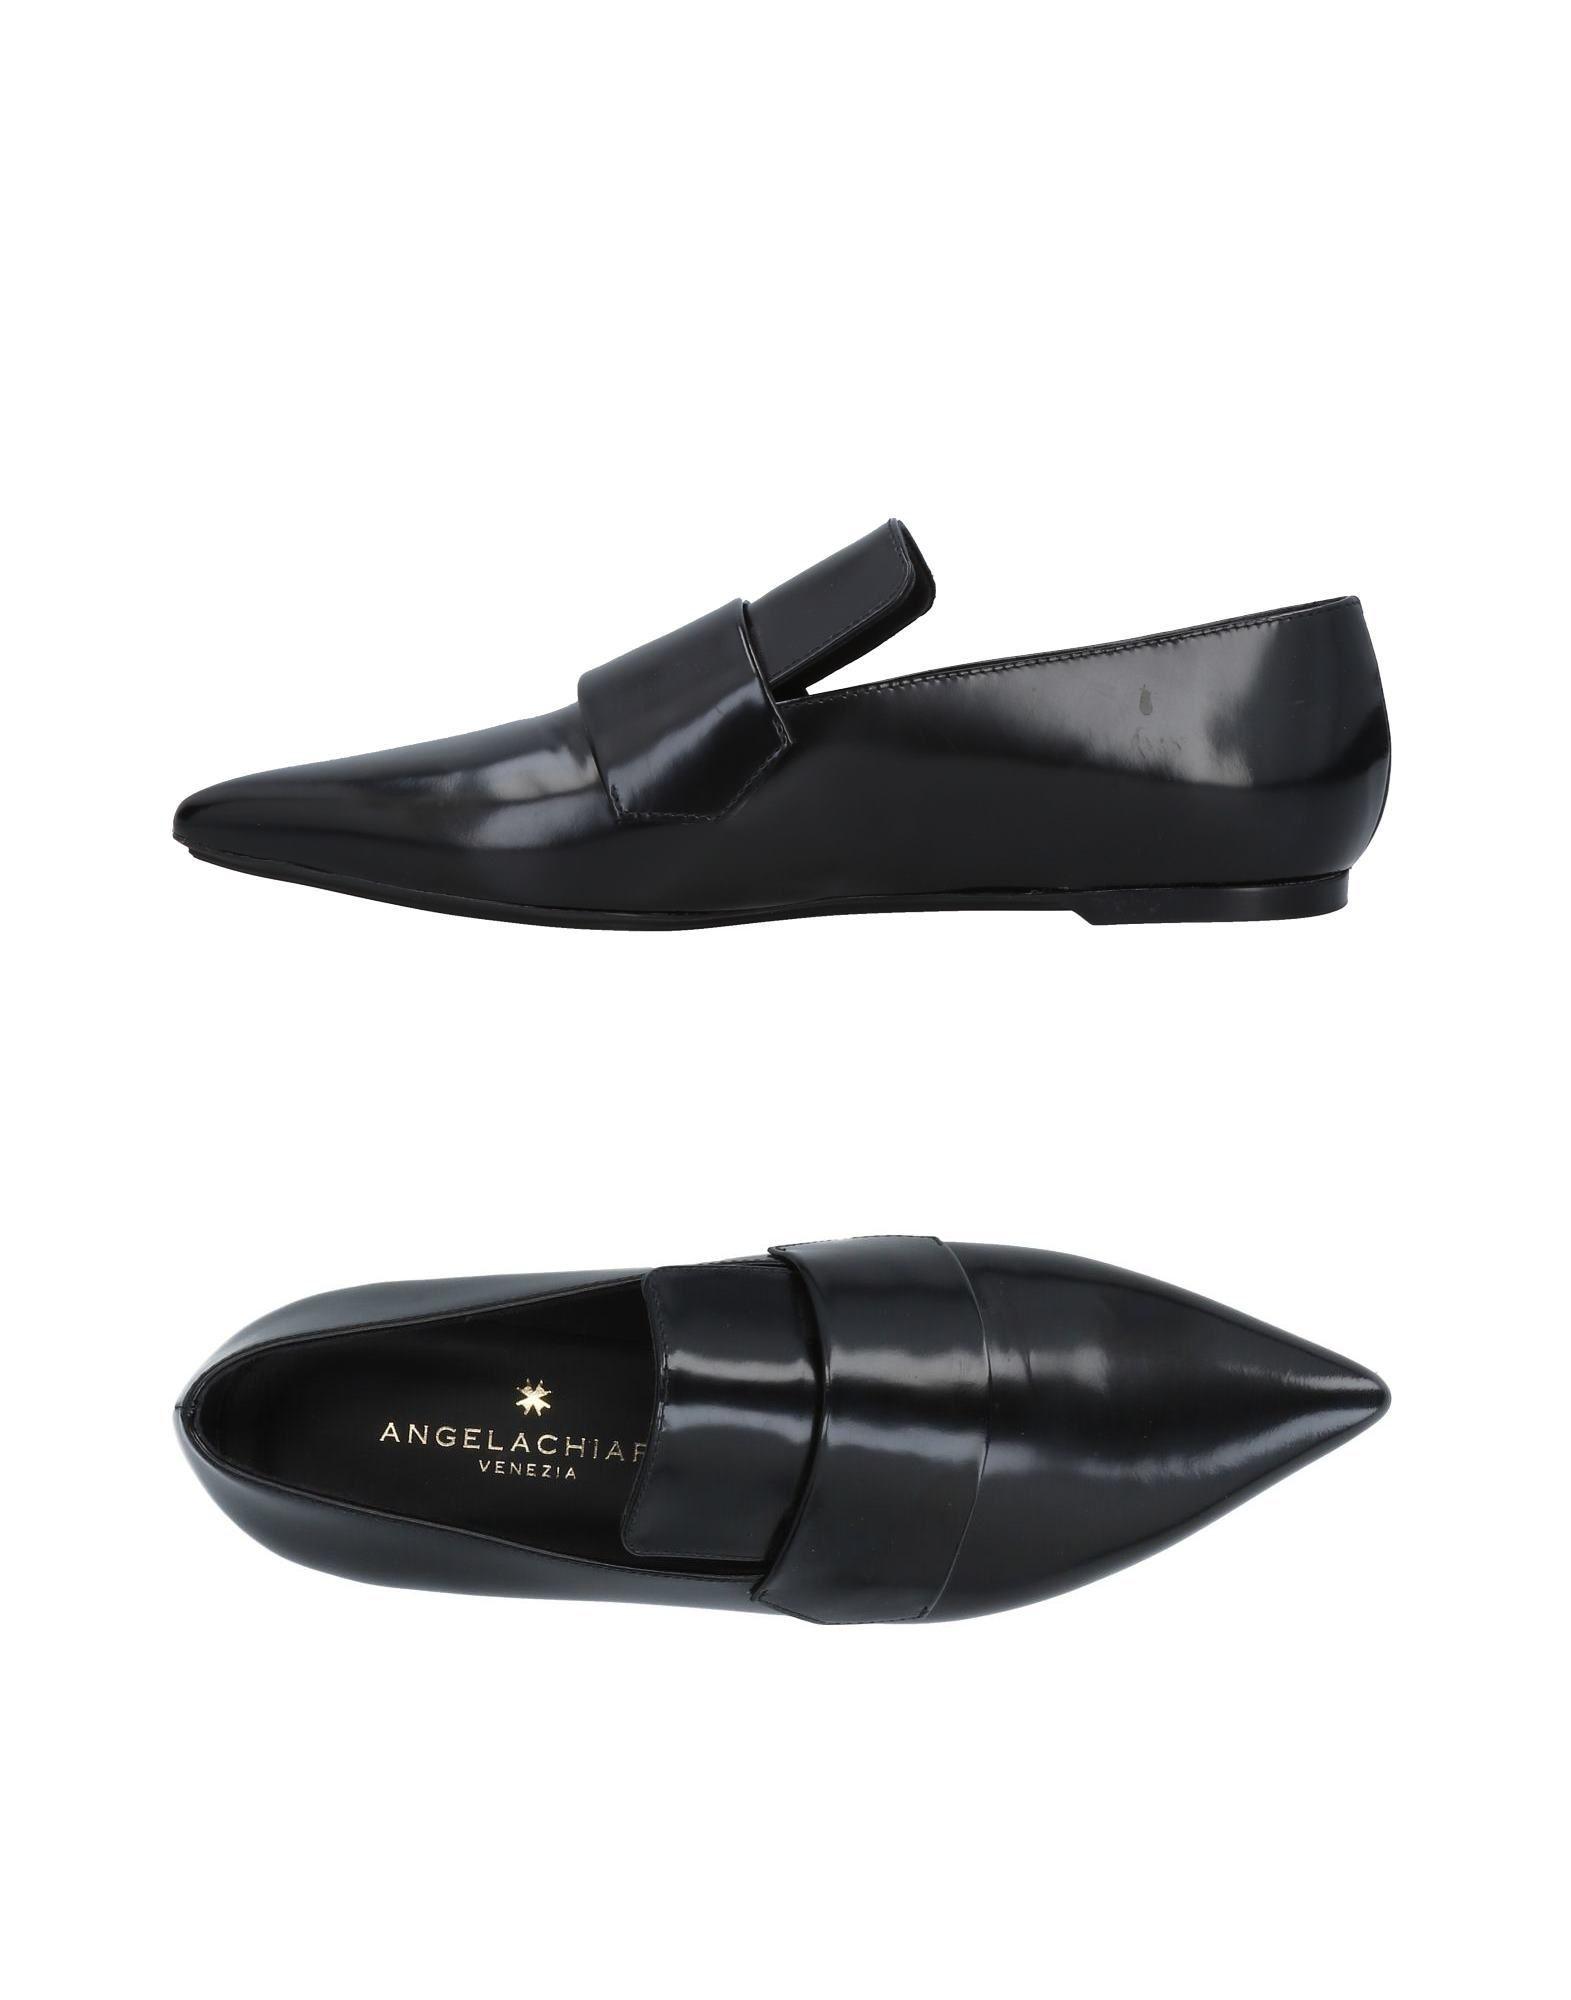 ANGELA CHIARA VENEZIA Loafers in Black